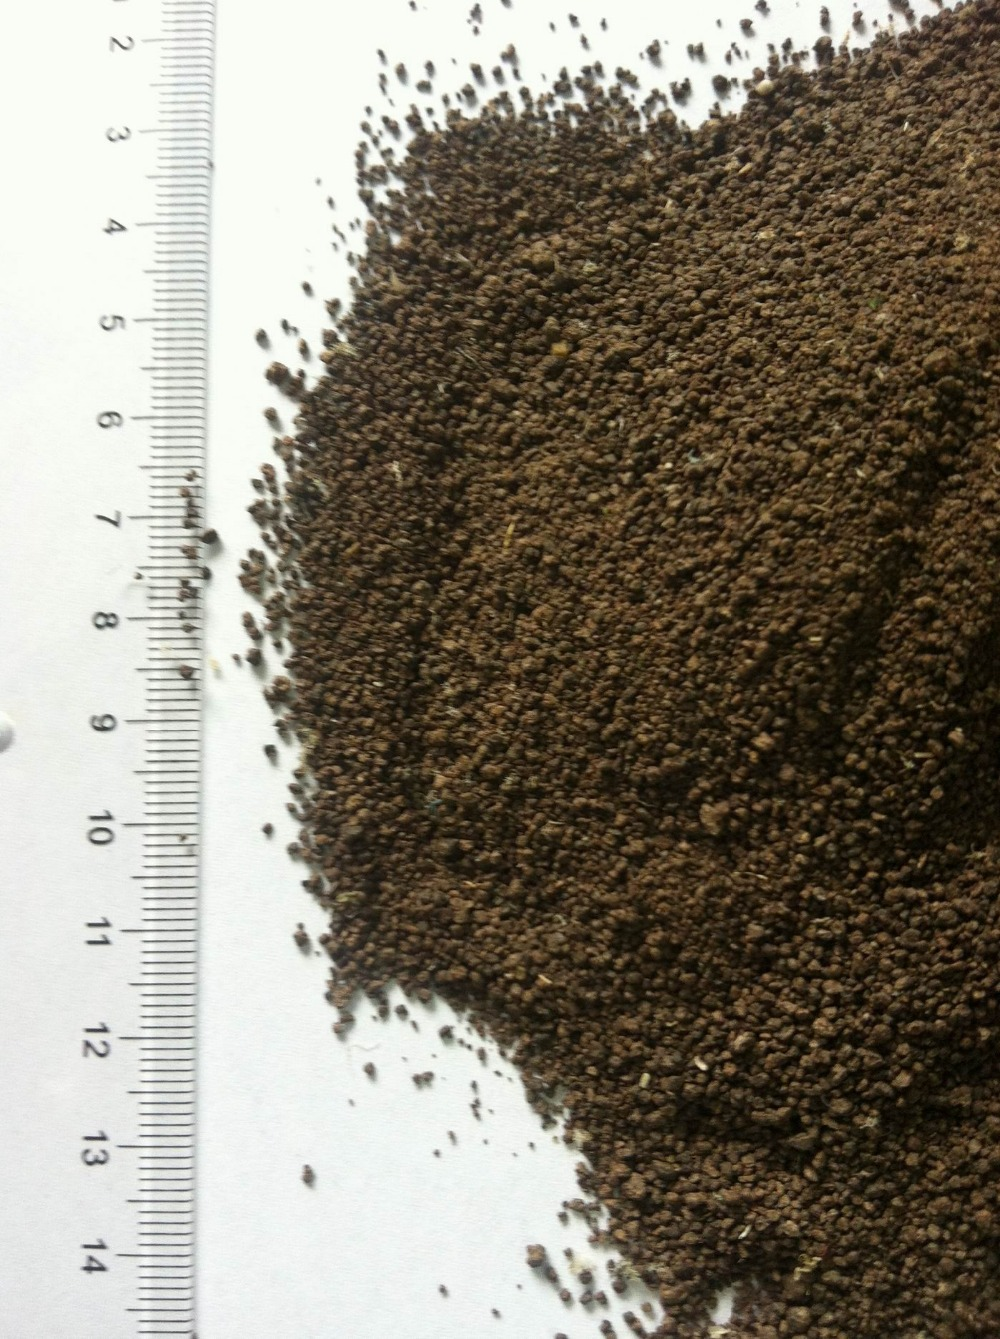 2-4mm,kelp chips